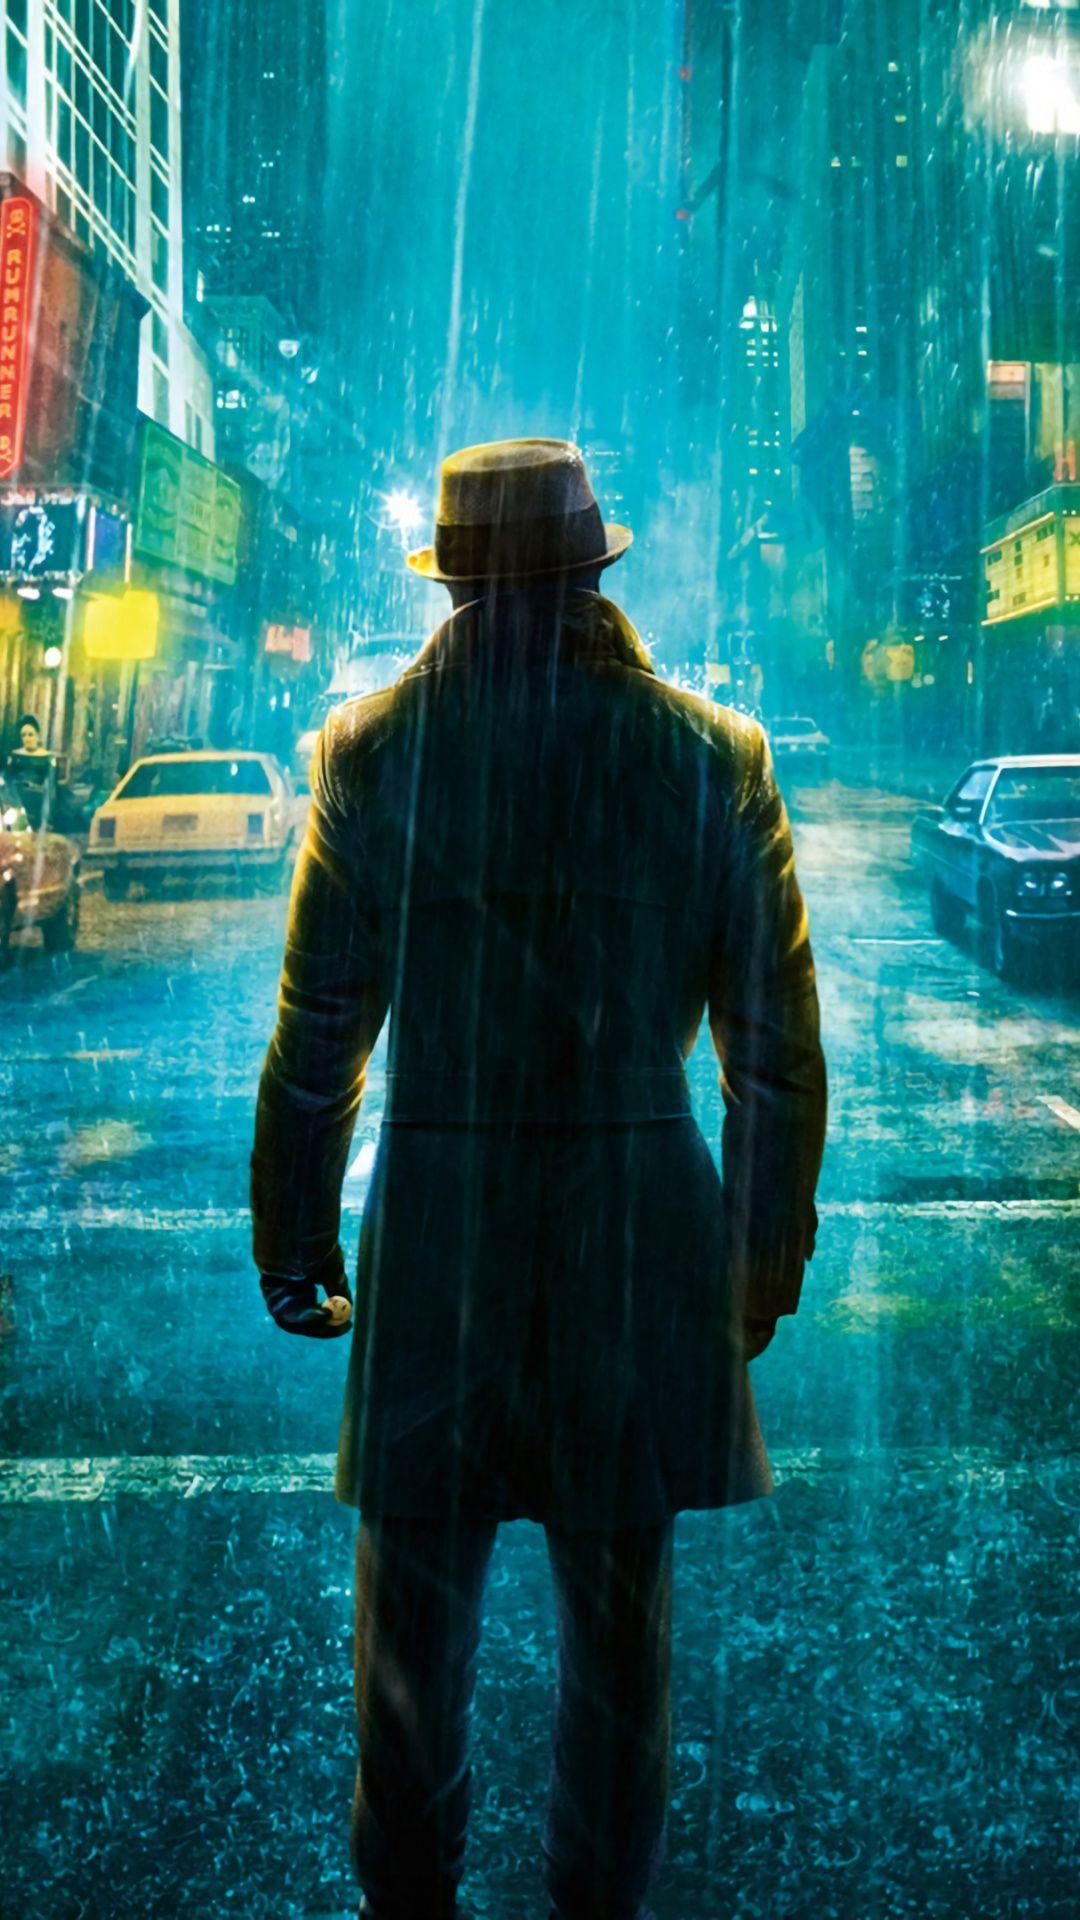 1080x1920 Rorschach Waifu Movie Watchmen Rain Street Wallpaper Rorschach Watchmen Rain Wallpapers